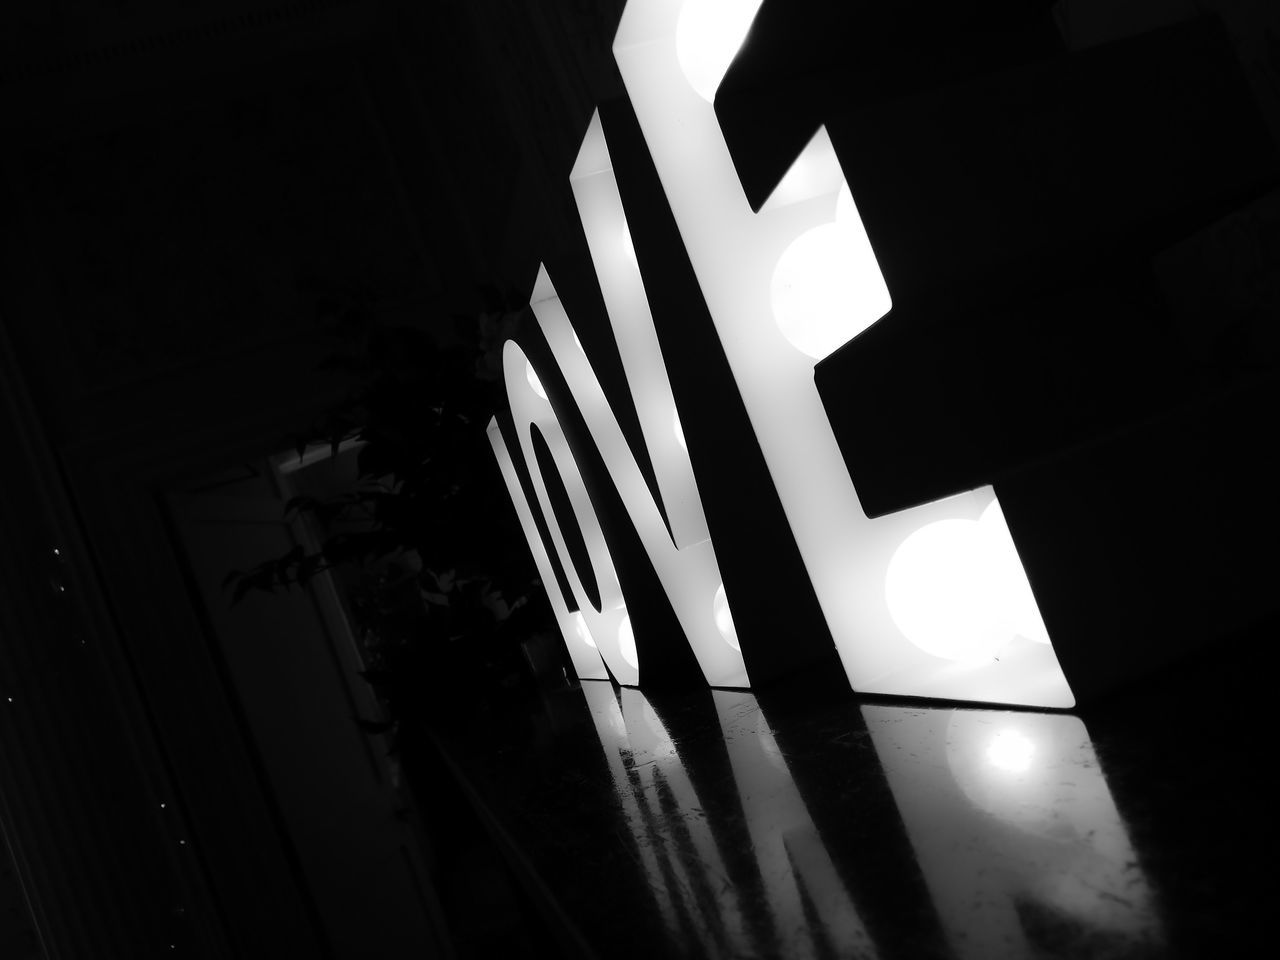 Illuminated Love In Darkroom